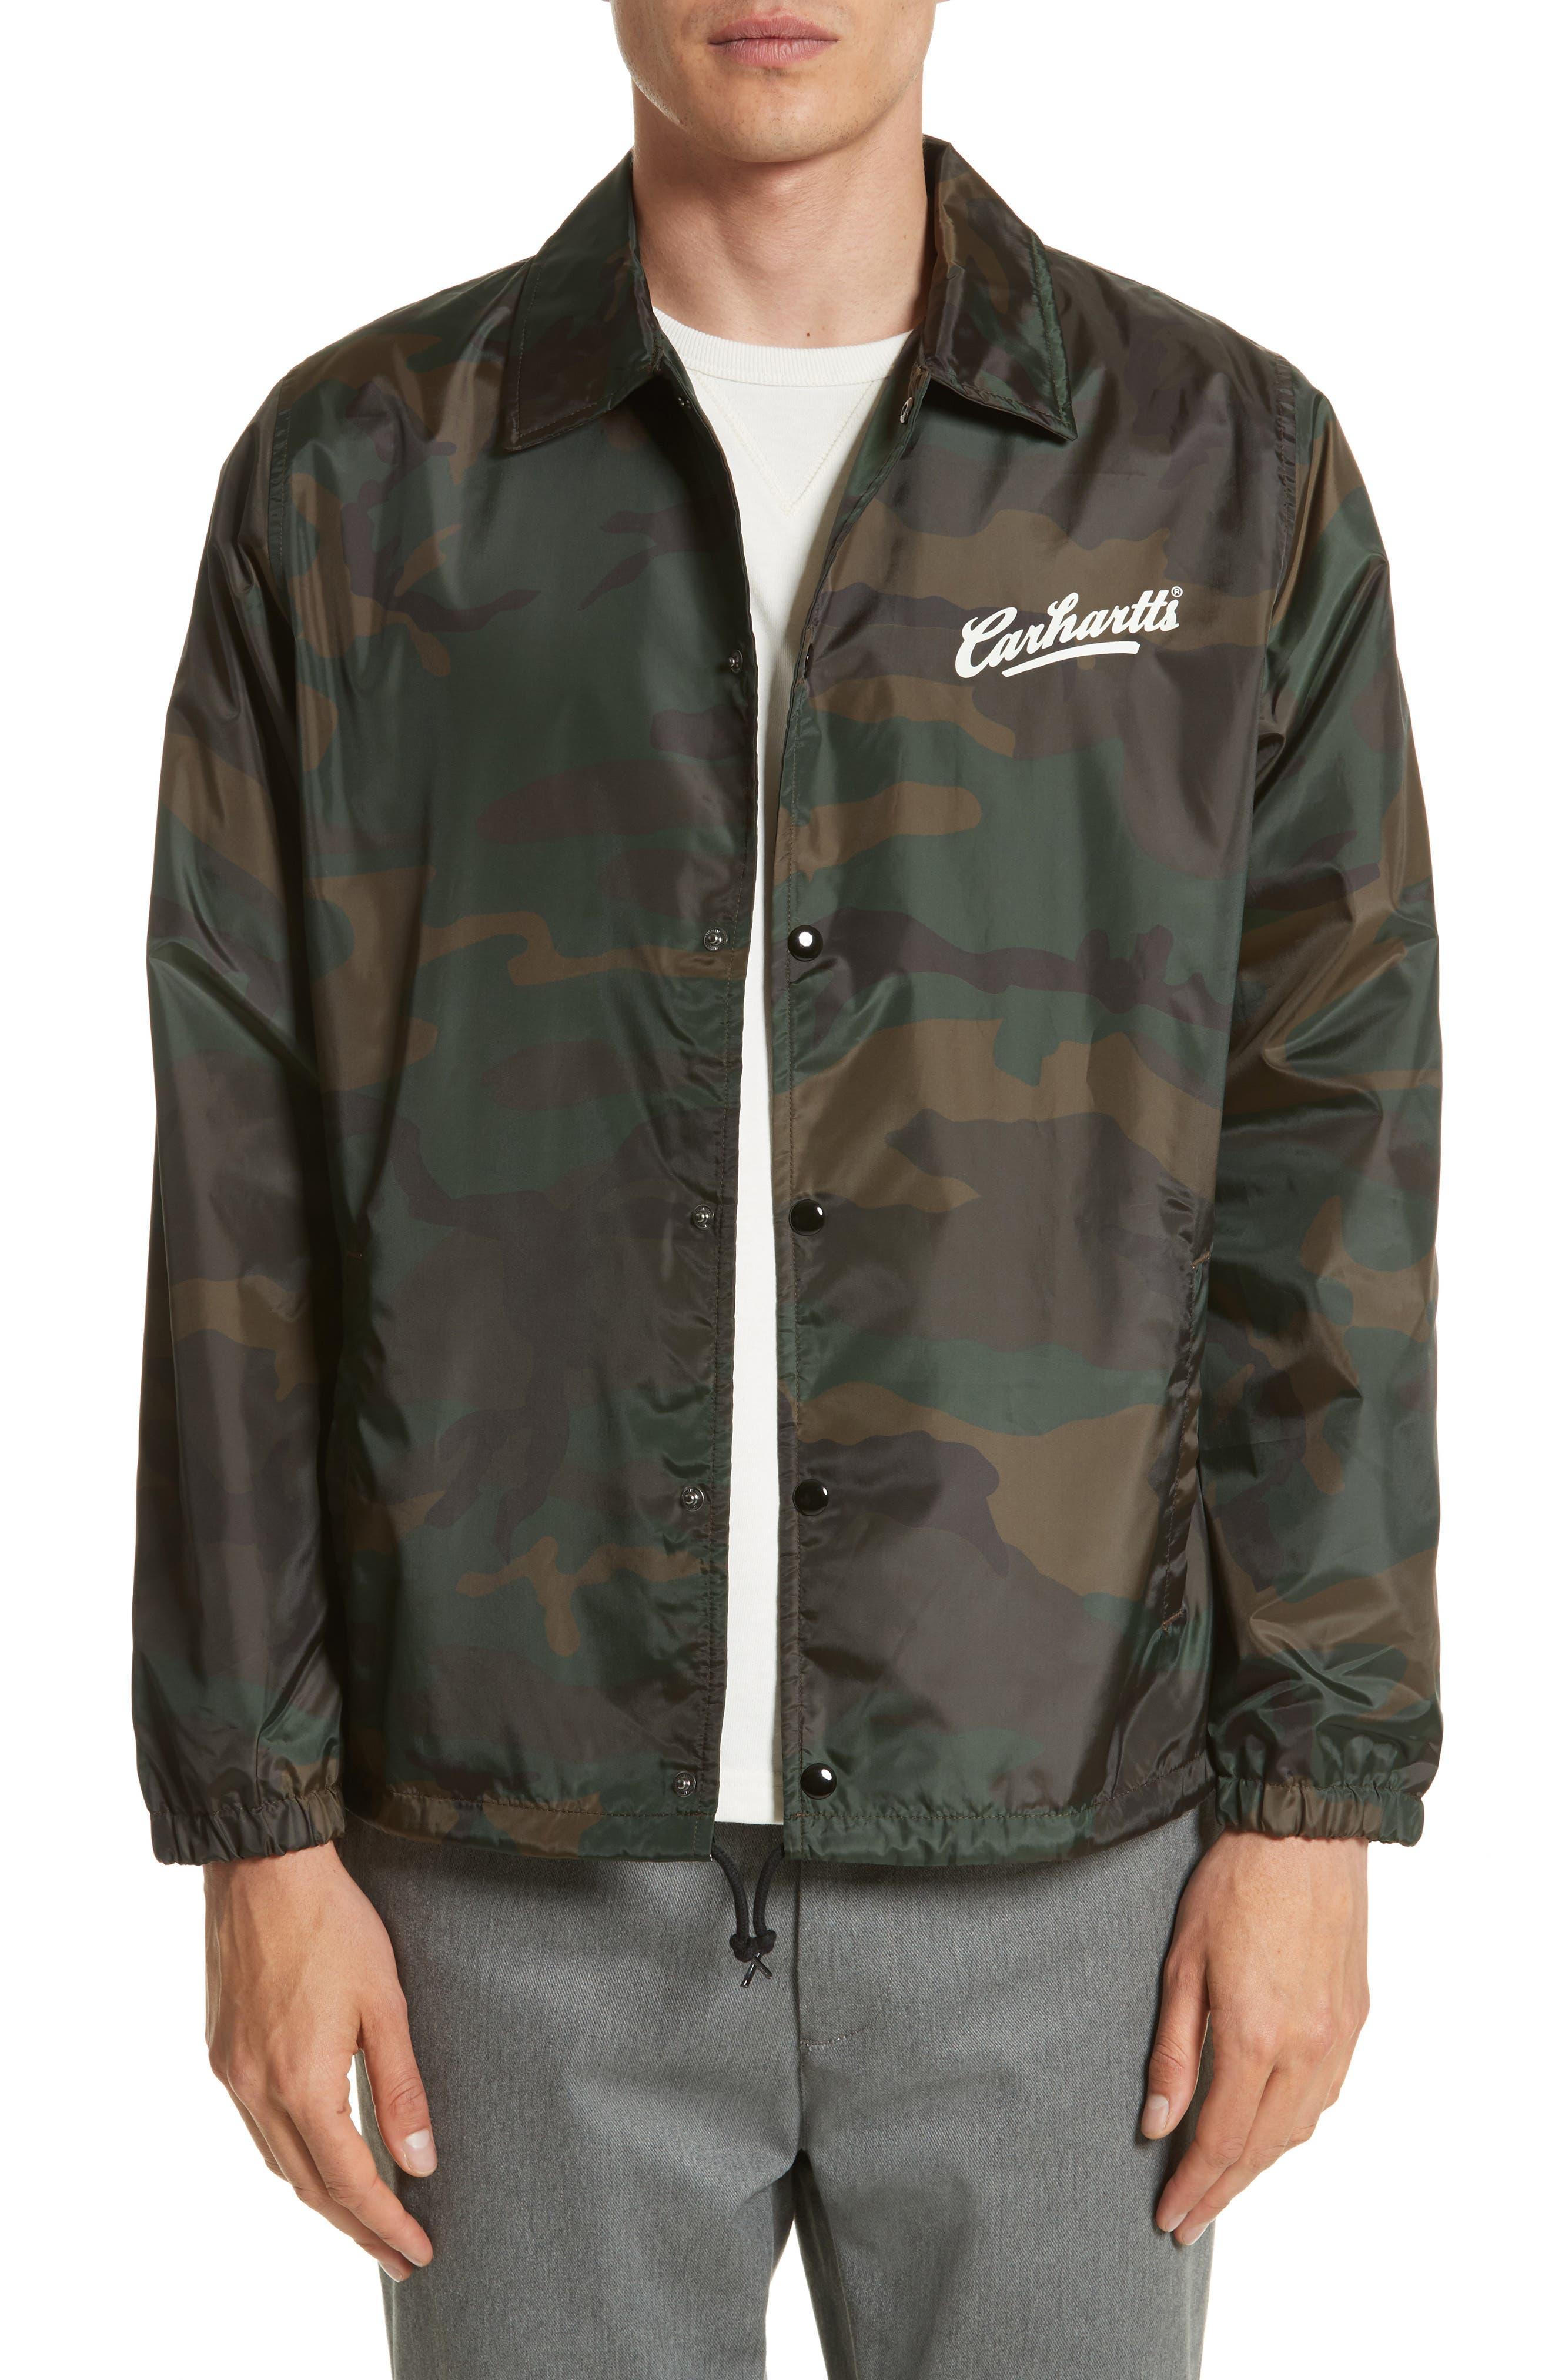 Carhartt Work in Progress Camo Print Coach Jacket